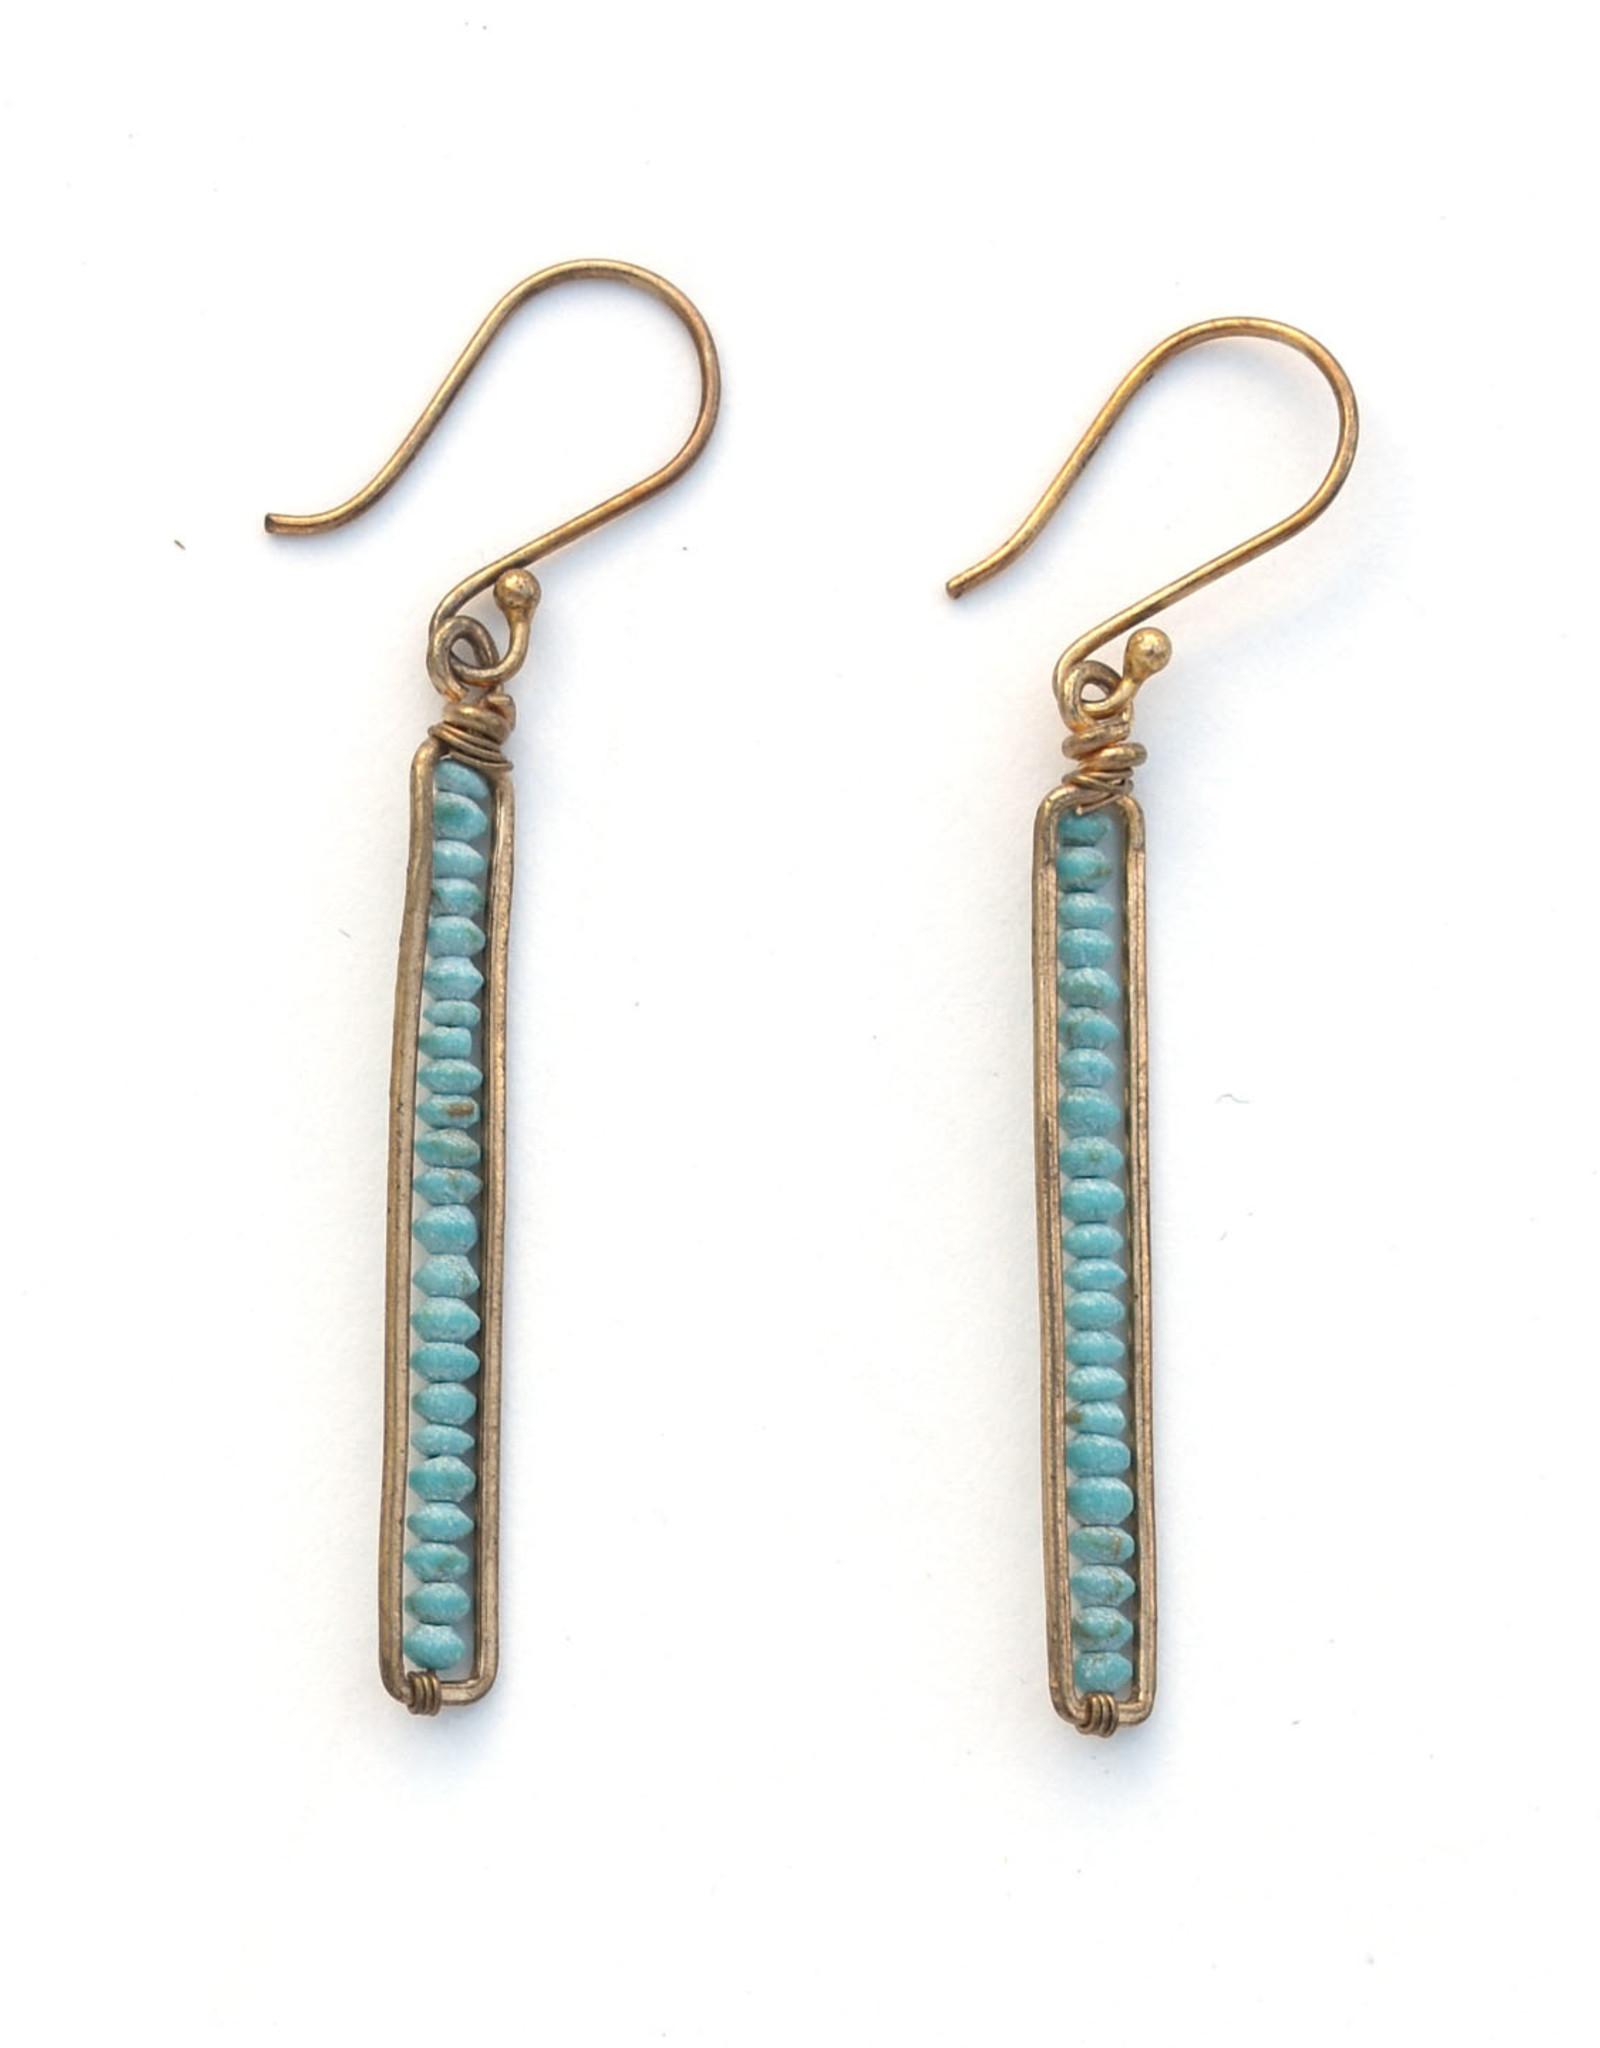 Peapod Earrings - Turquoise